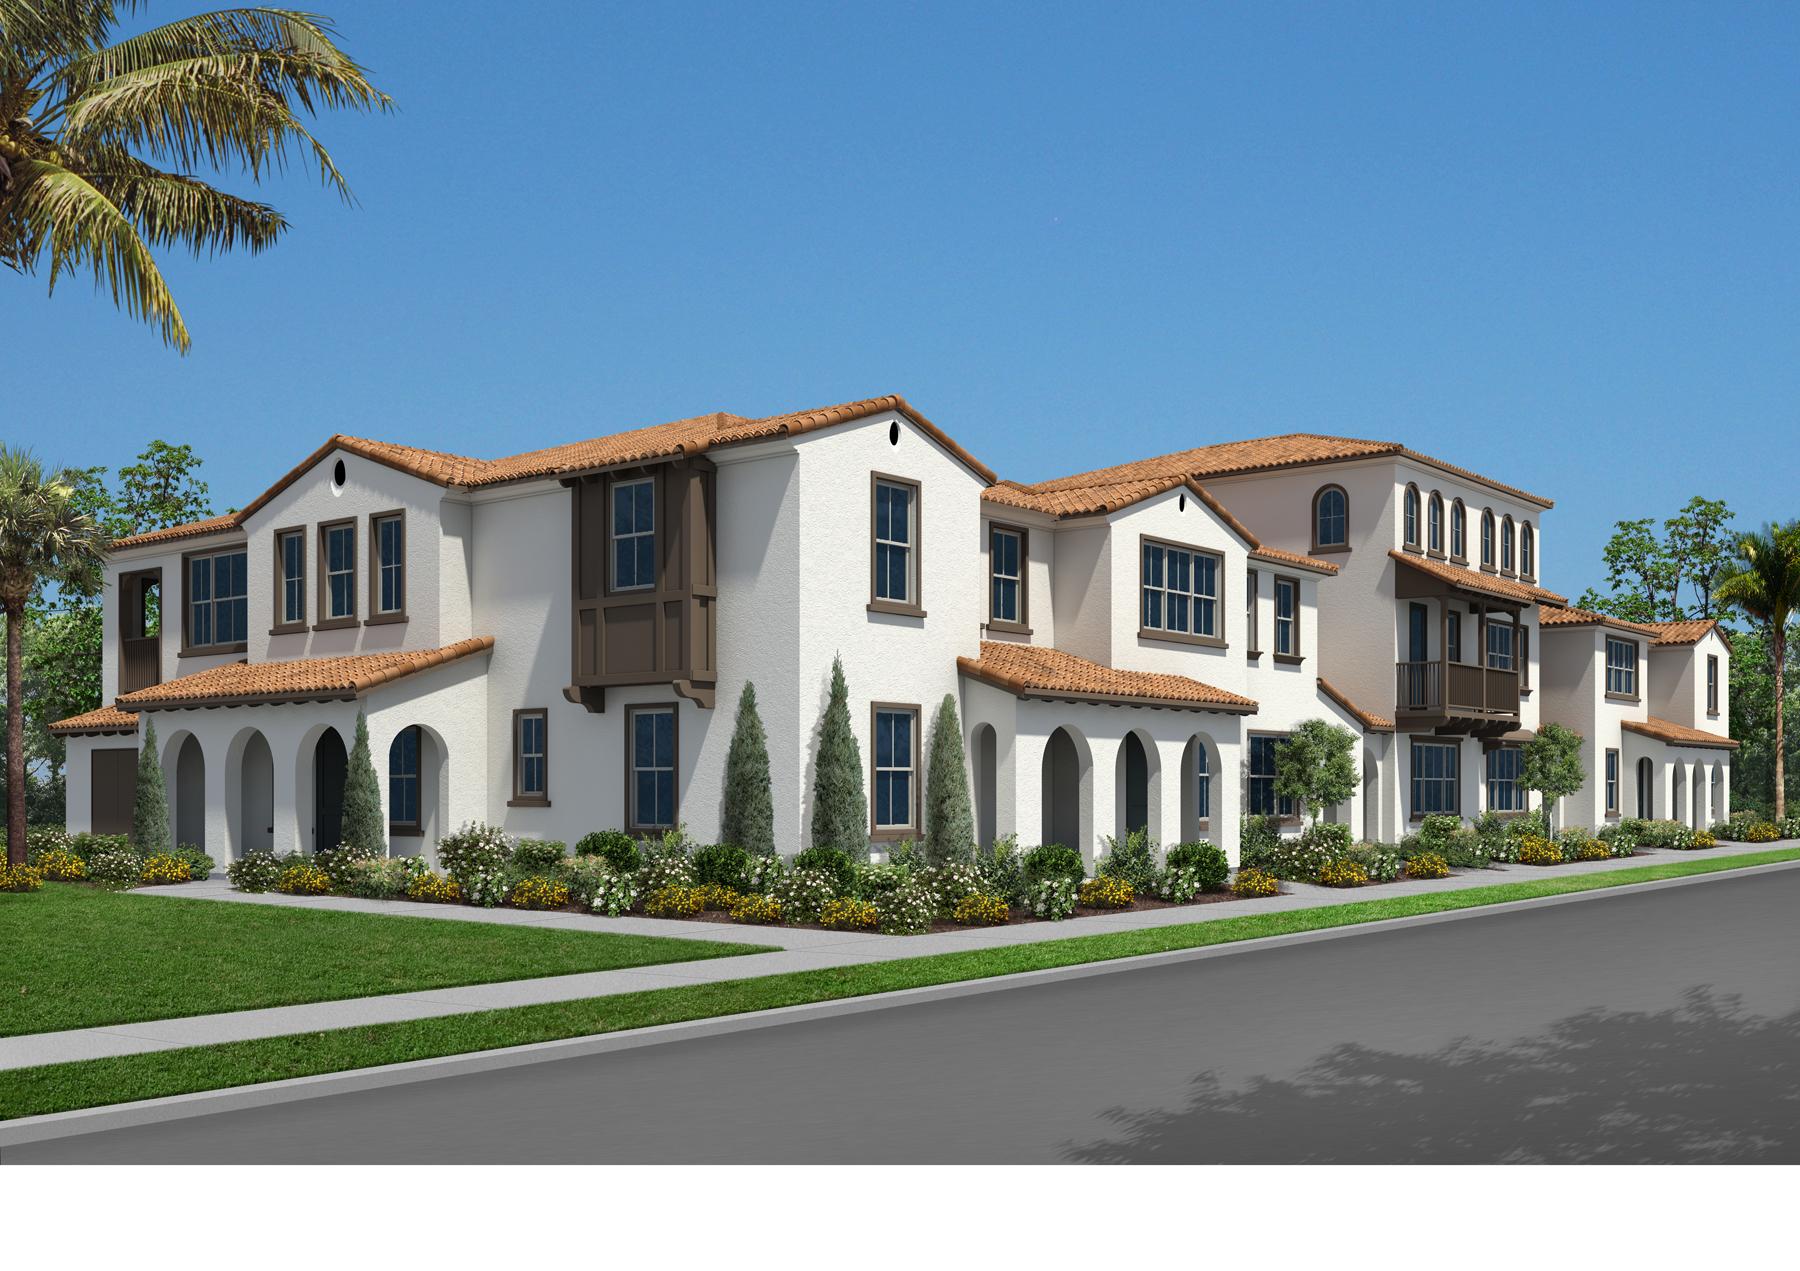 azusa new homes, azusa real estate, new azusa townhomes